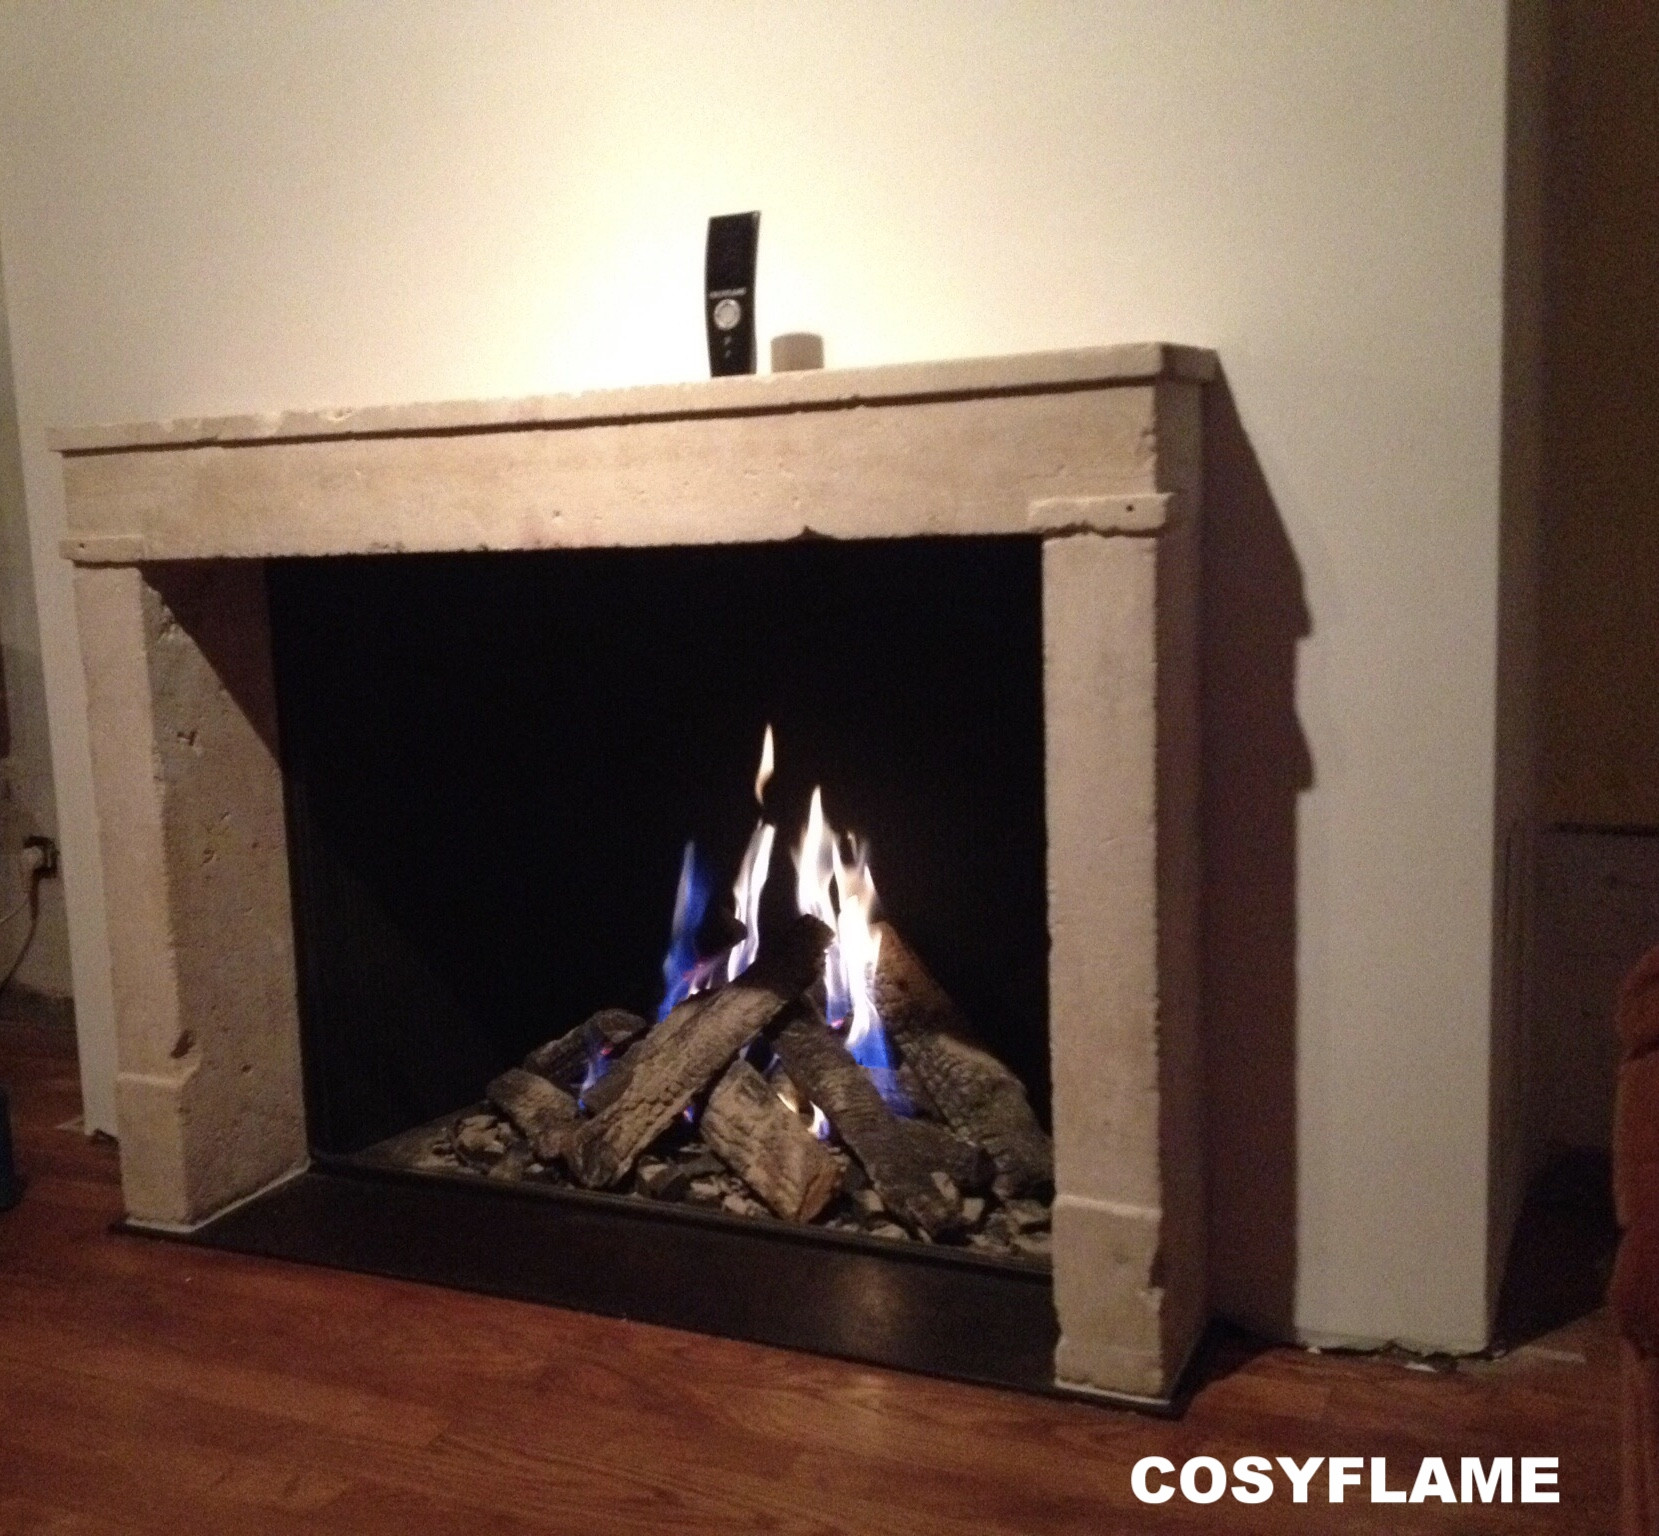 Cosyflame-Effen-binnenwanden-file-49.jpeg